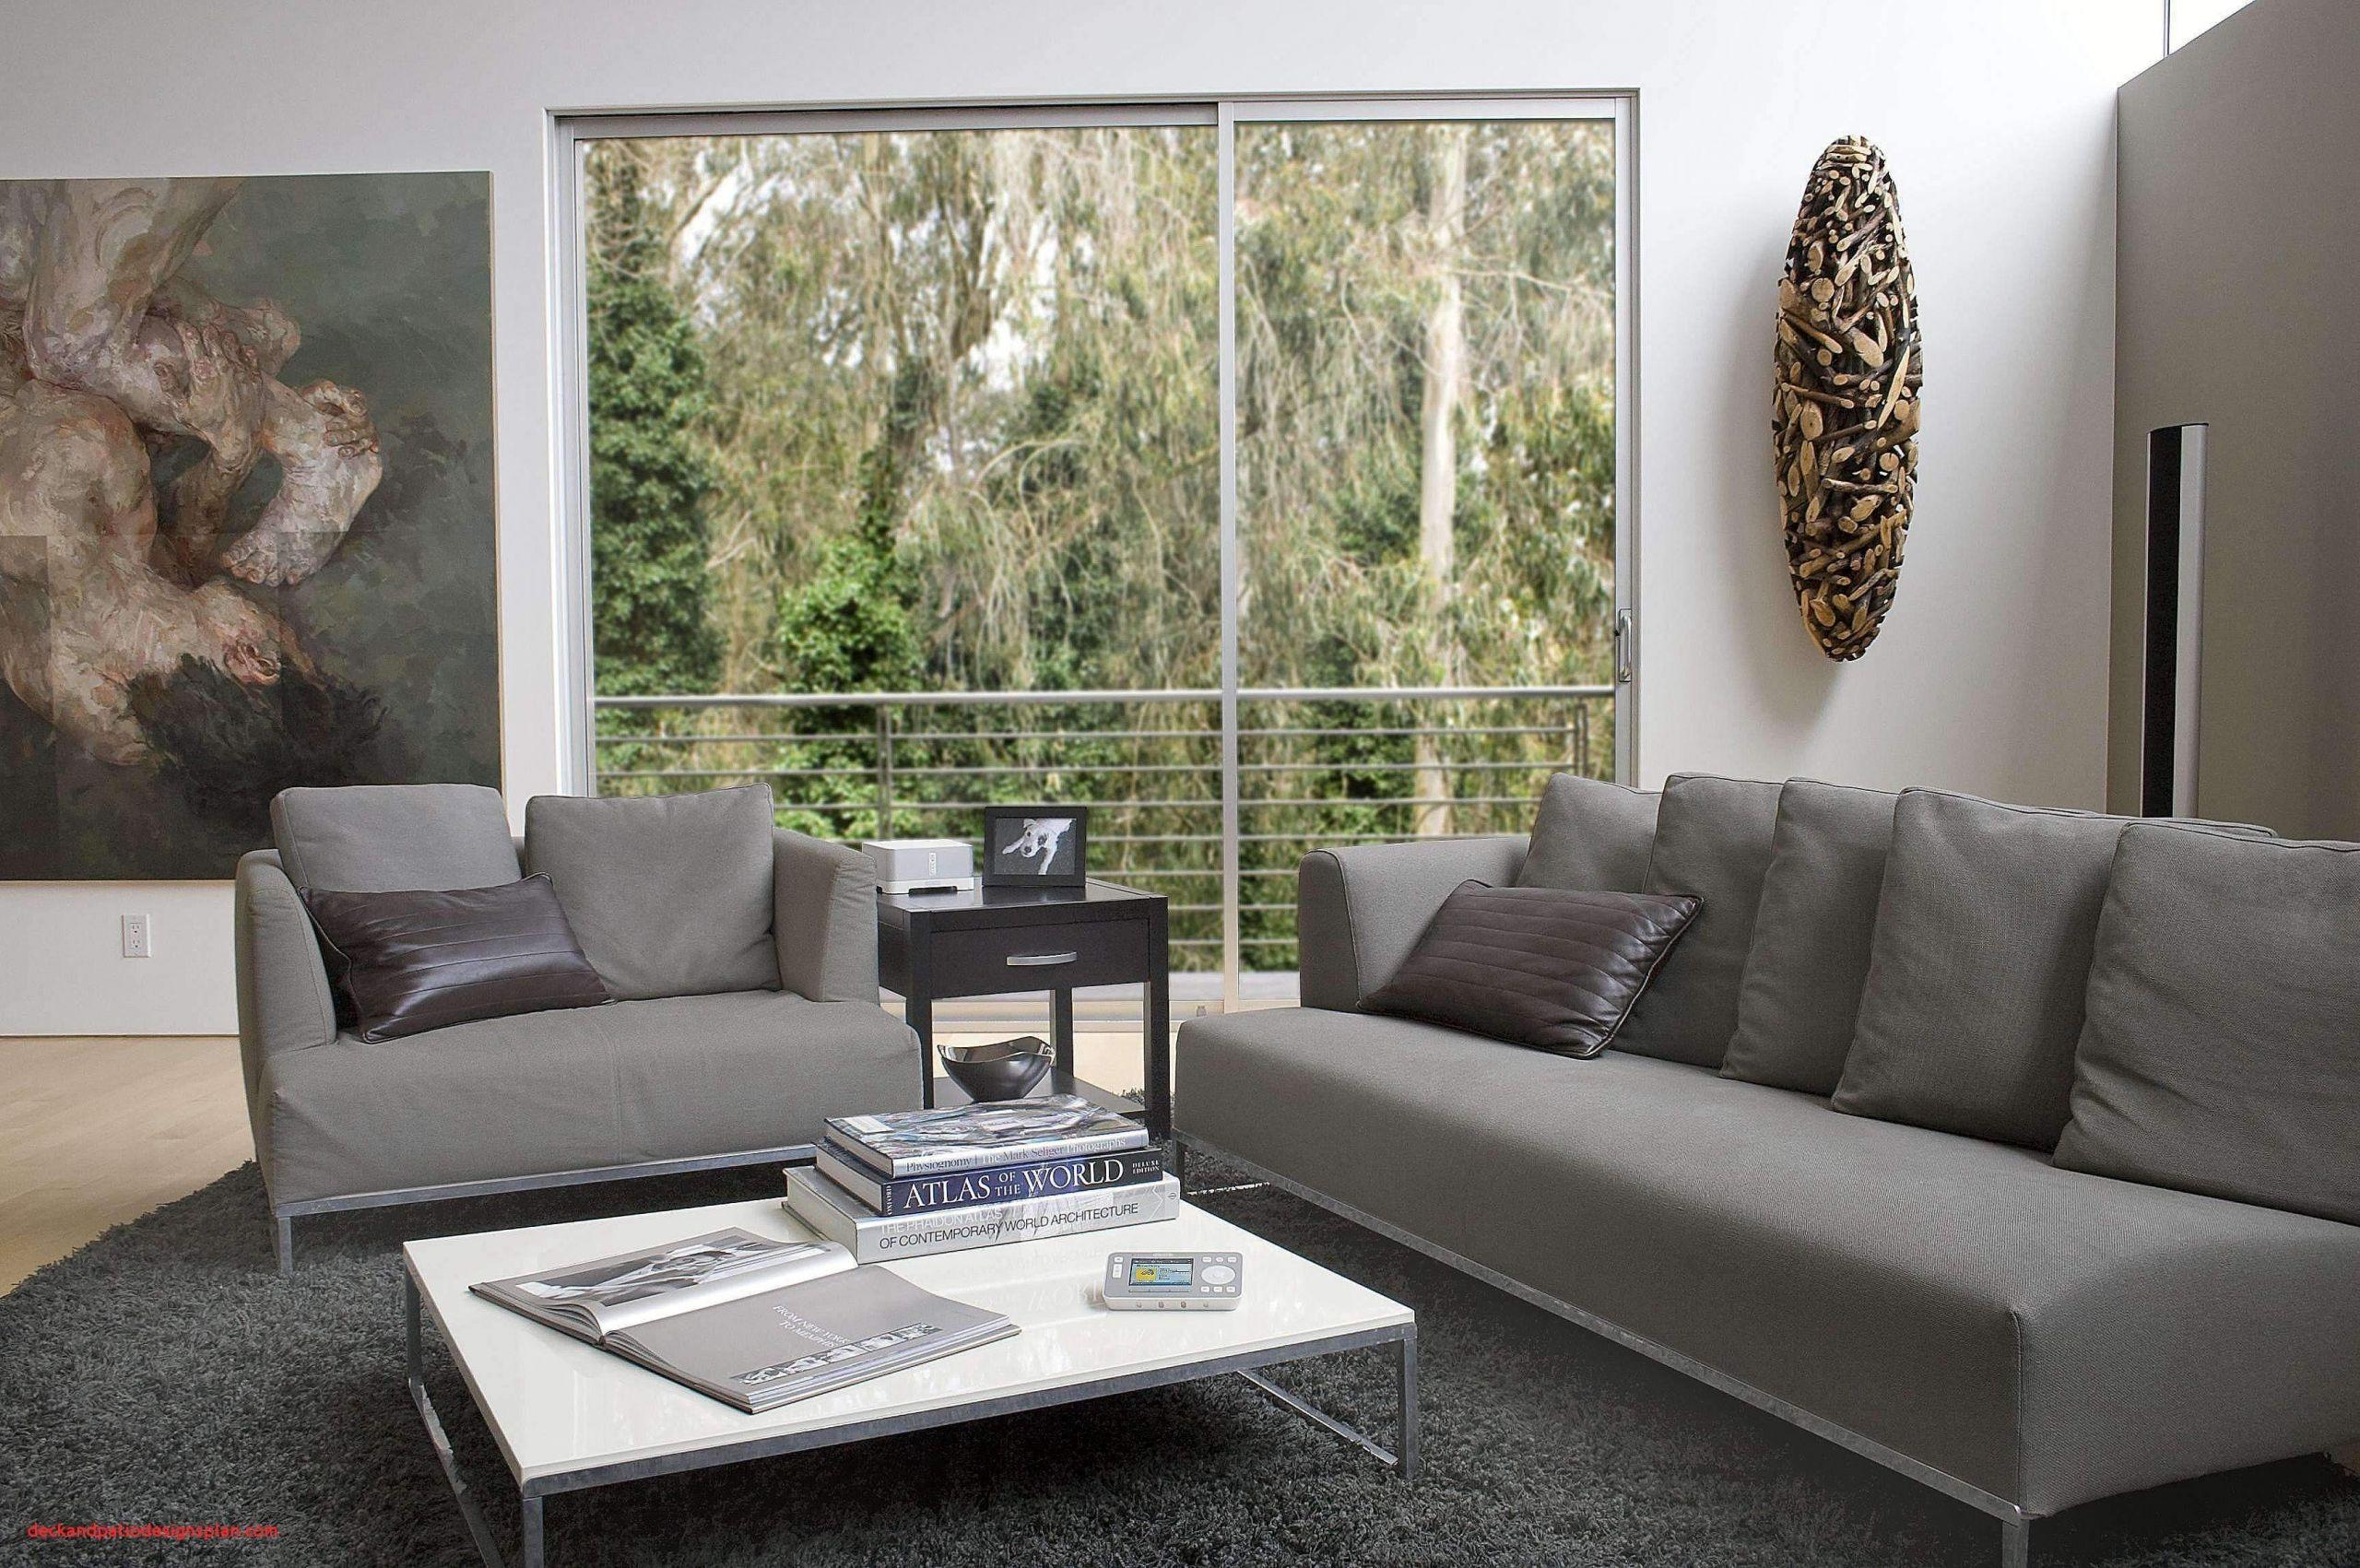 gartenstuhle kaufen moderne garten lounge awesome terrasse sofa awesome bequeme sofa 0d of gartenstuhle kaufen 1